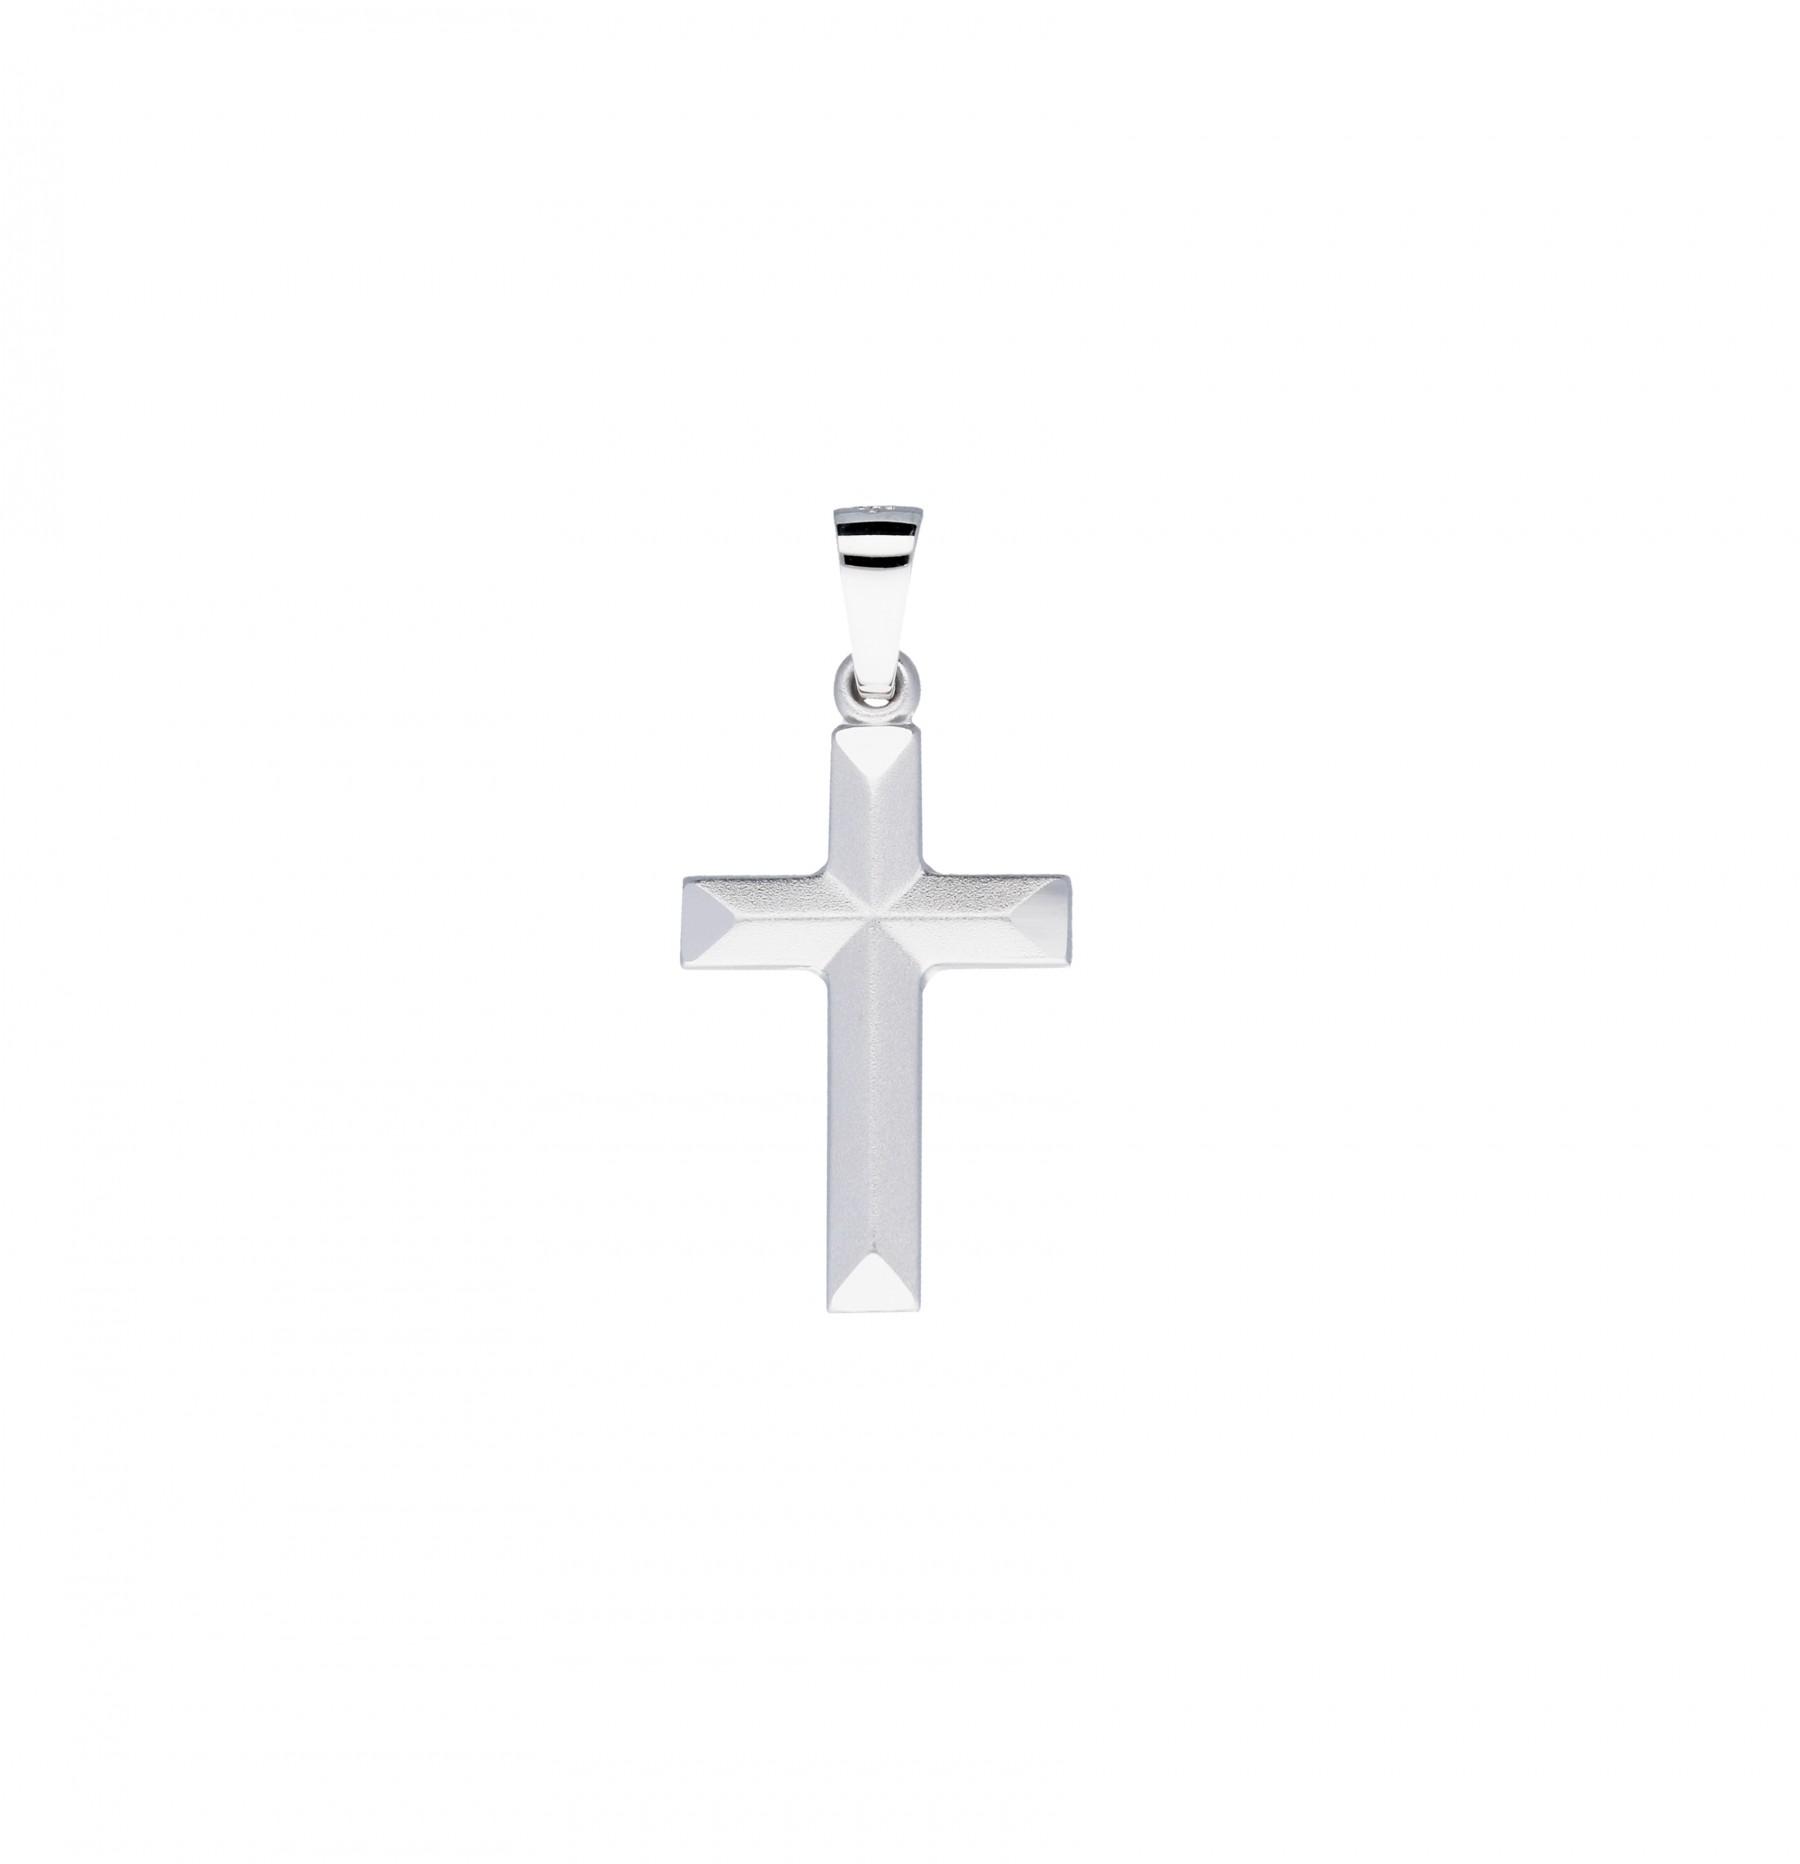 Religious Witgouden Kruisje - 25 X 12 Mm Witgoud Mat Glanzend 246.3000.00